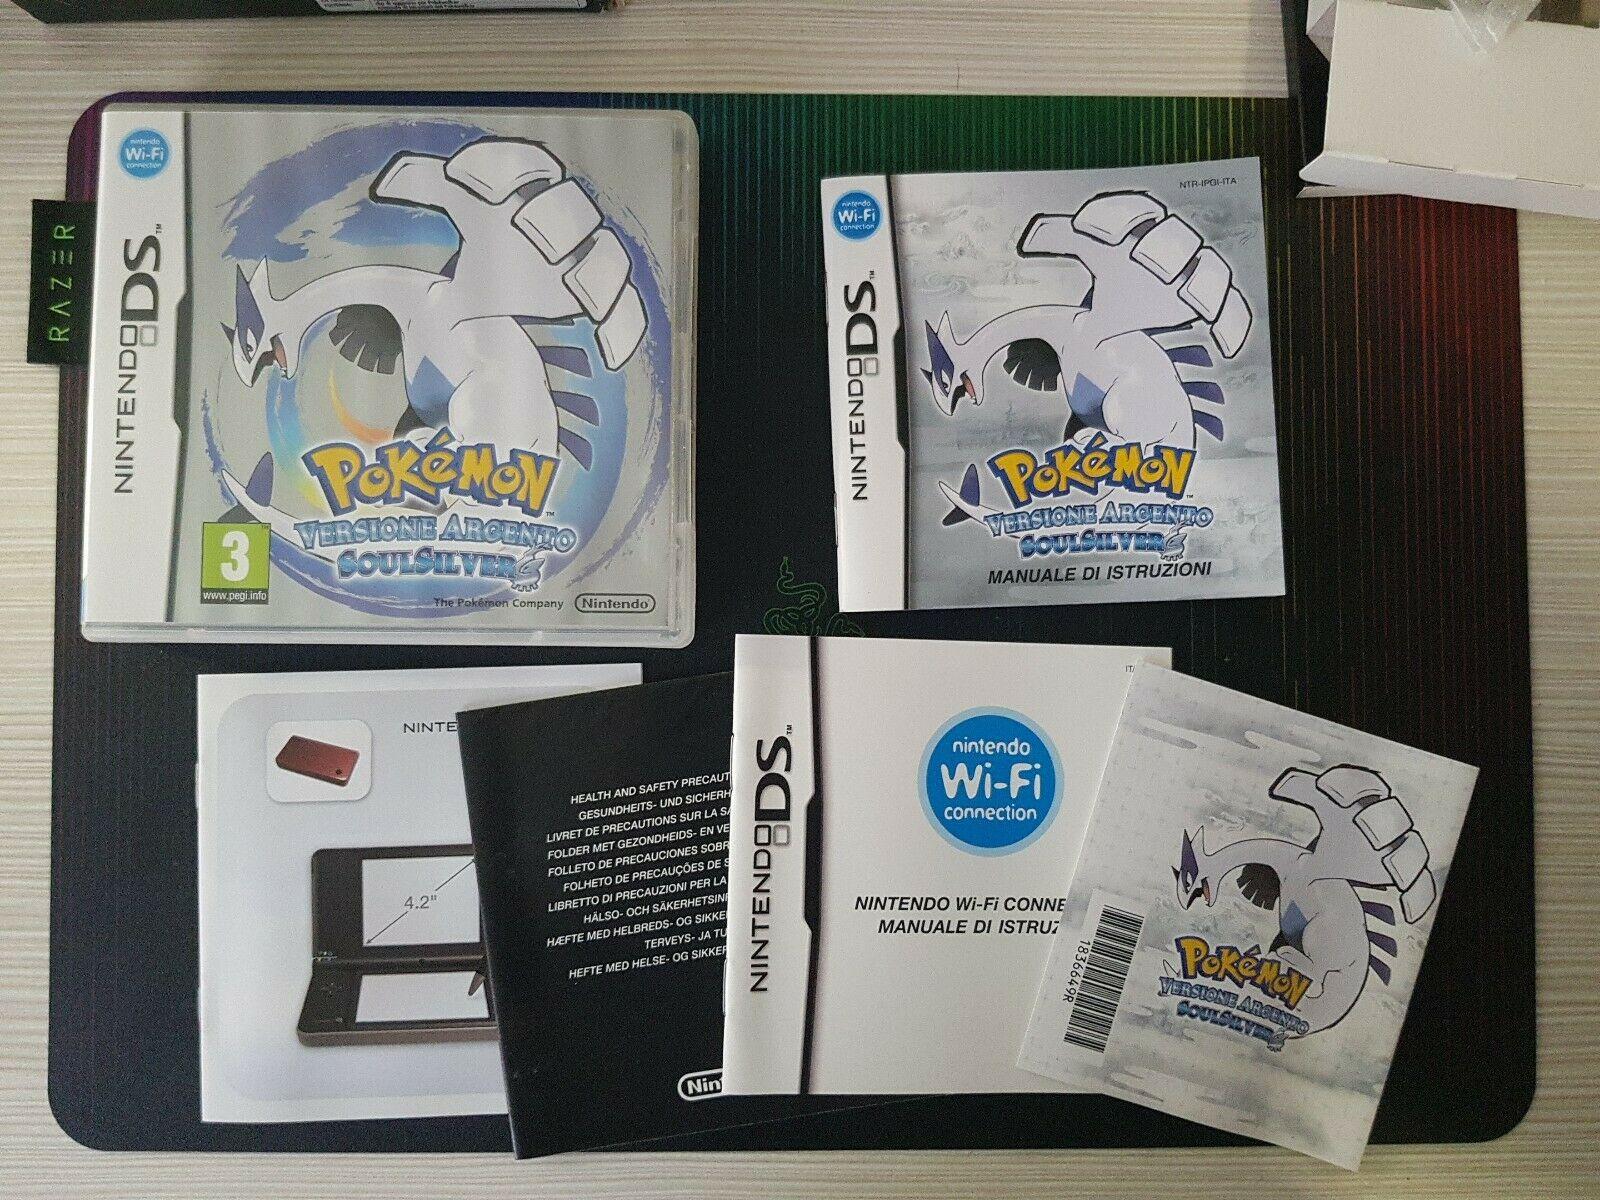 Dettaglio Pokémon Versione Argento SoulSilver con Pokewalker